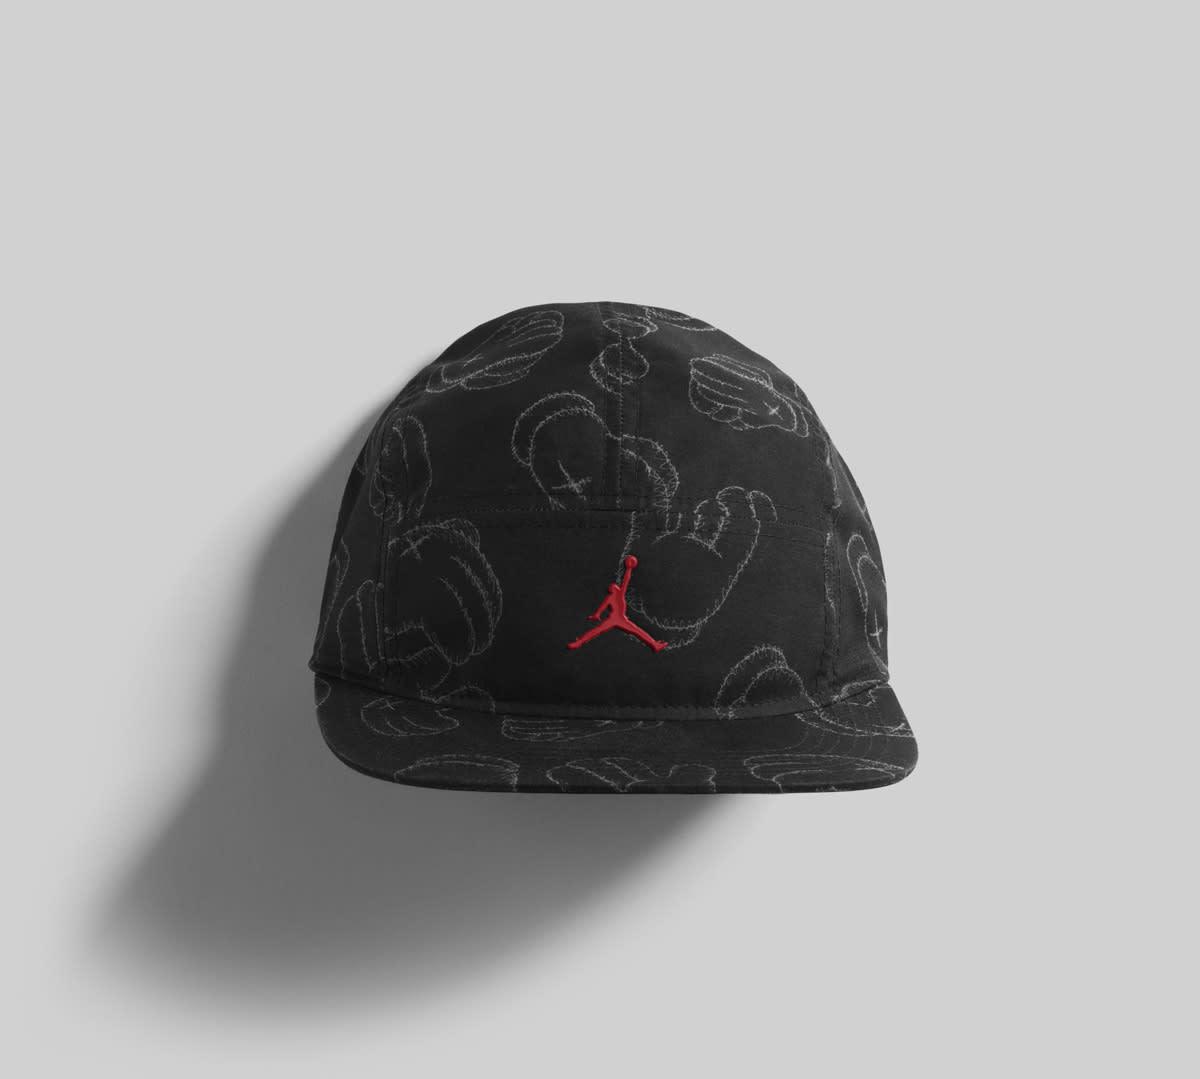 Jordan Brand x Kaws